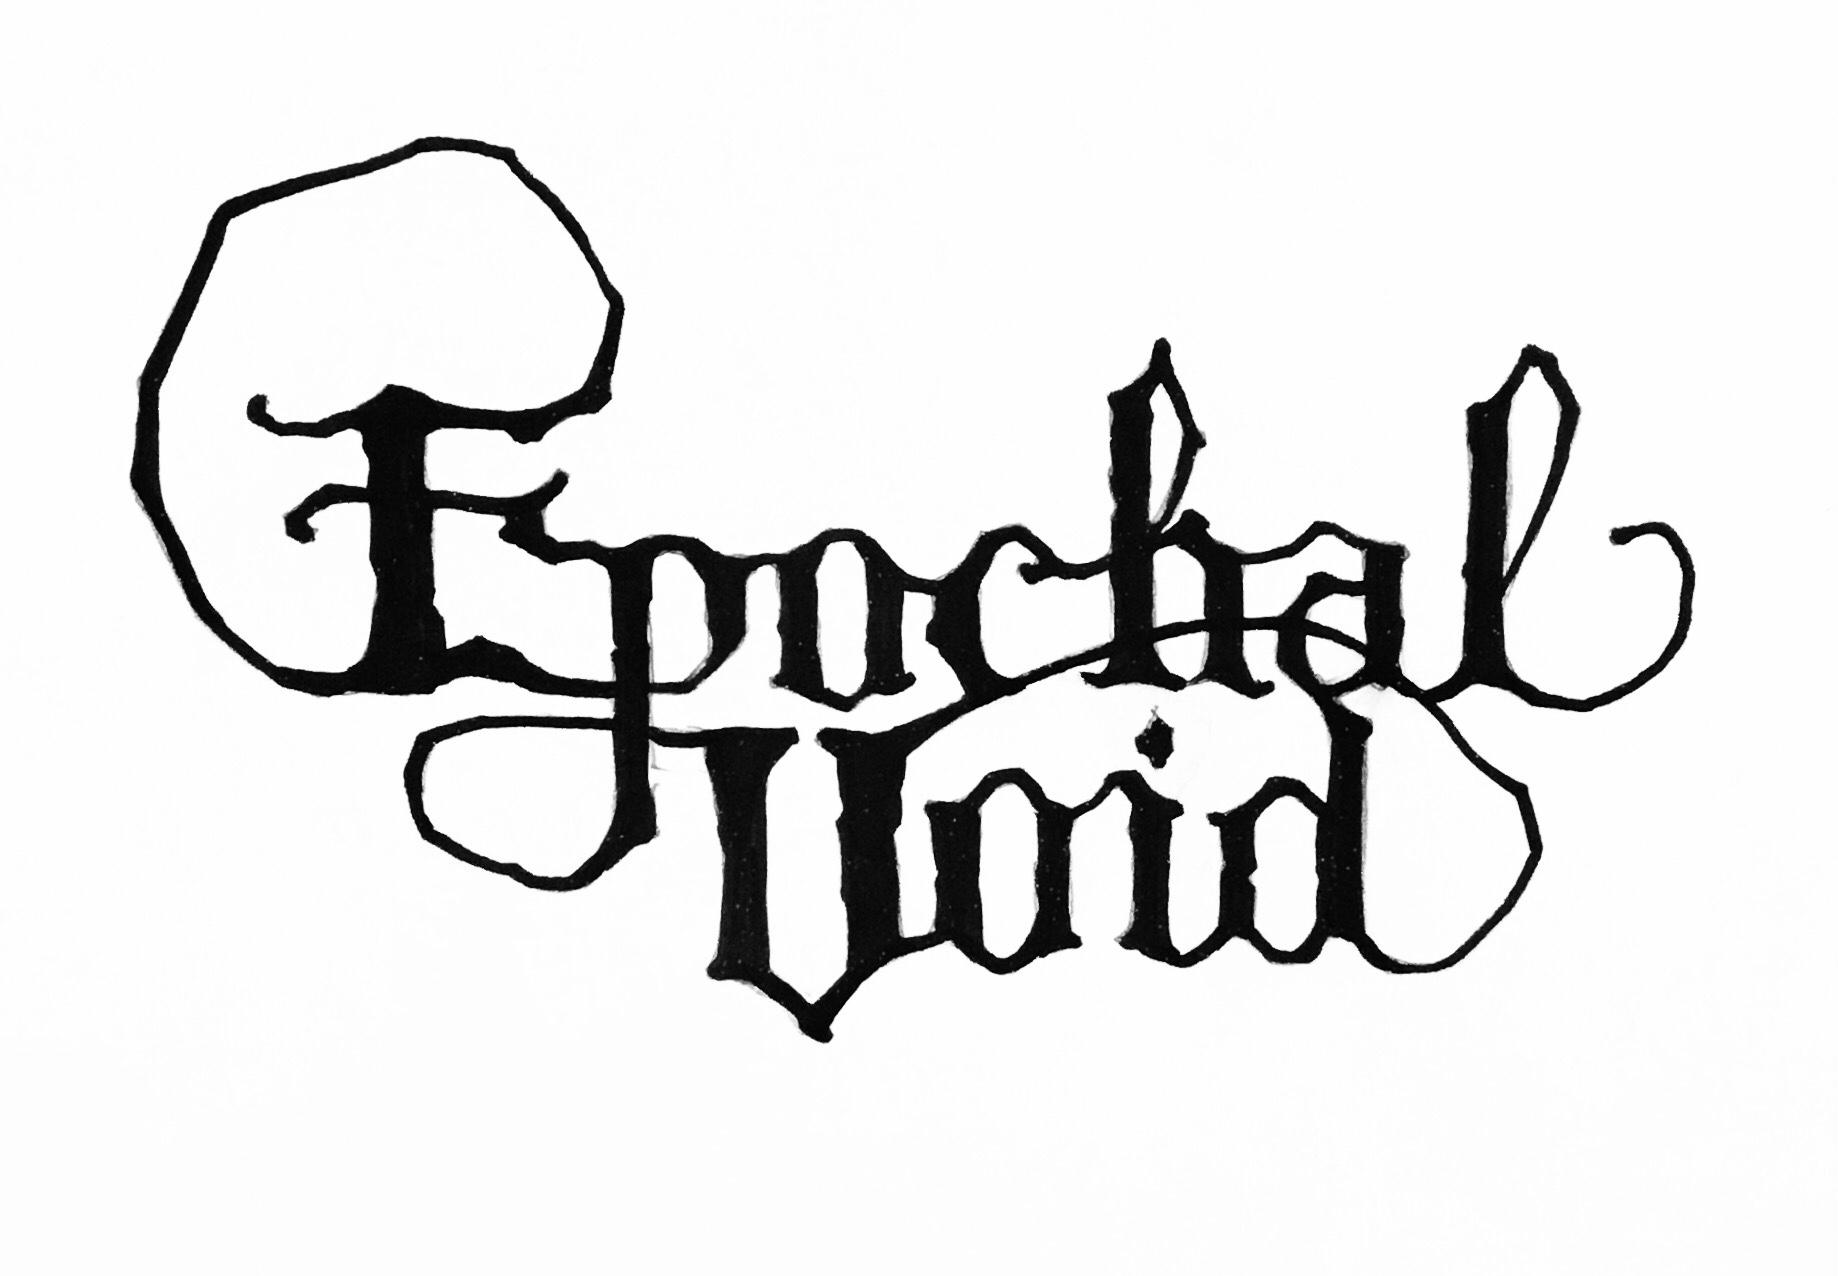 Epochal Void's Signature